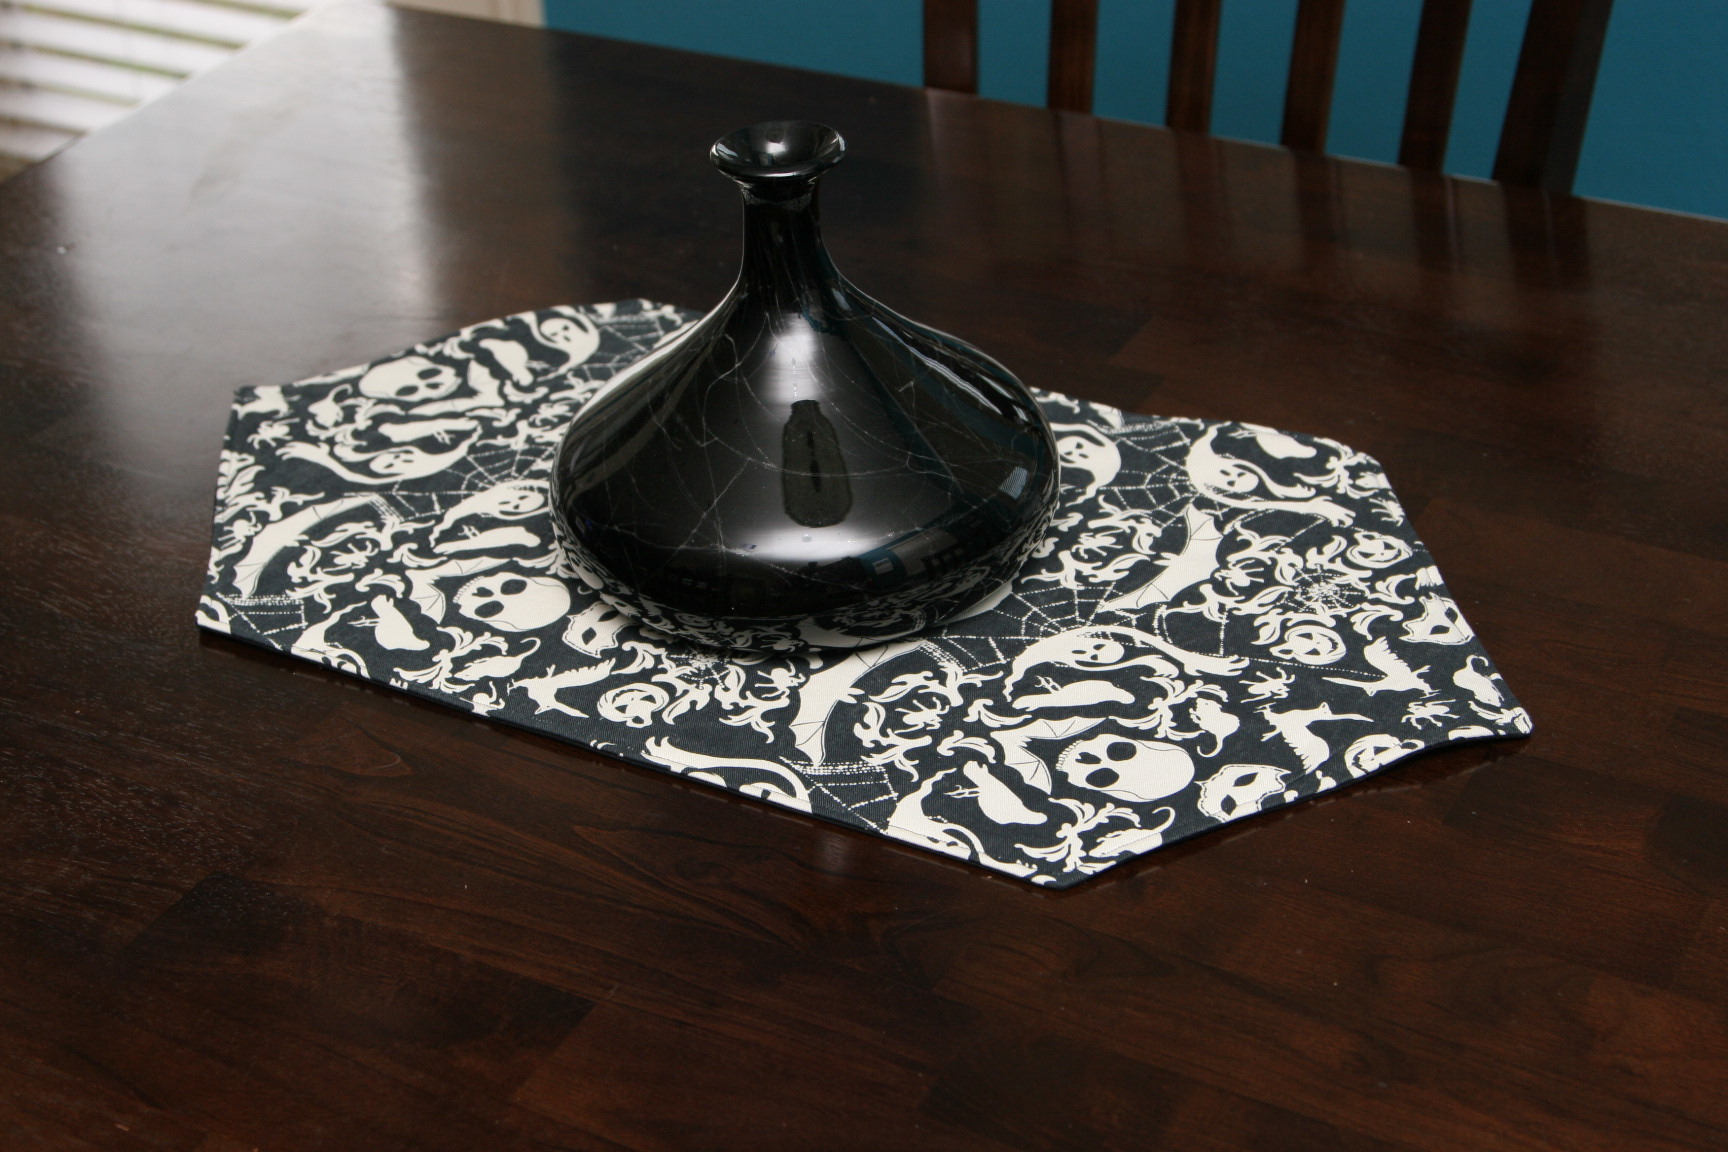 Dish Towels Turned Reversible Table Runner